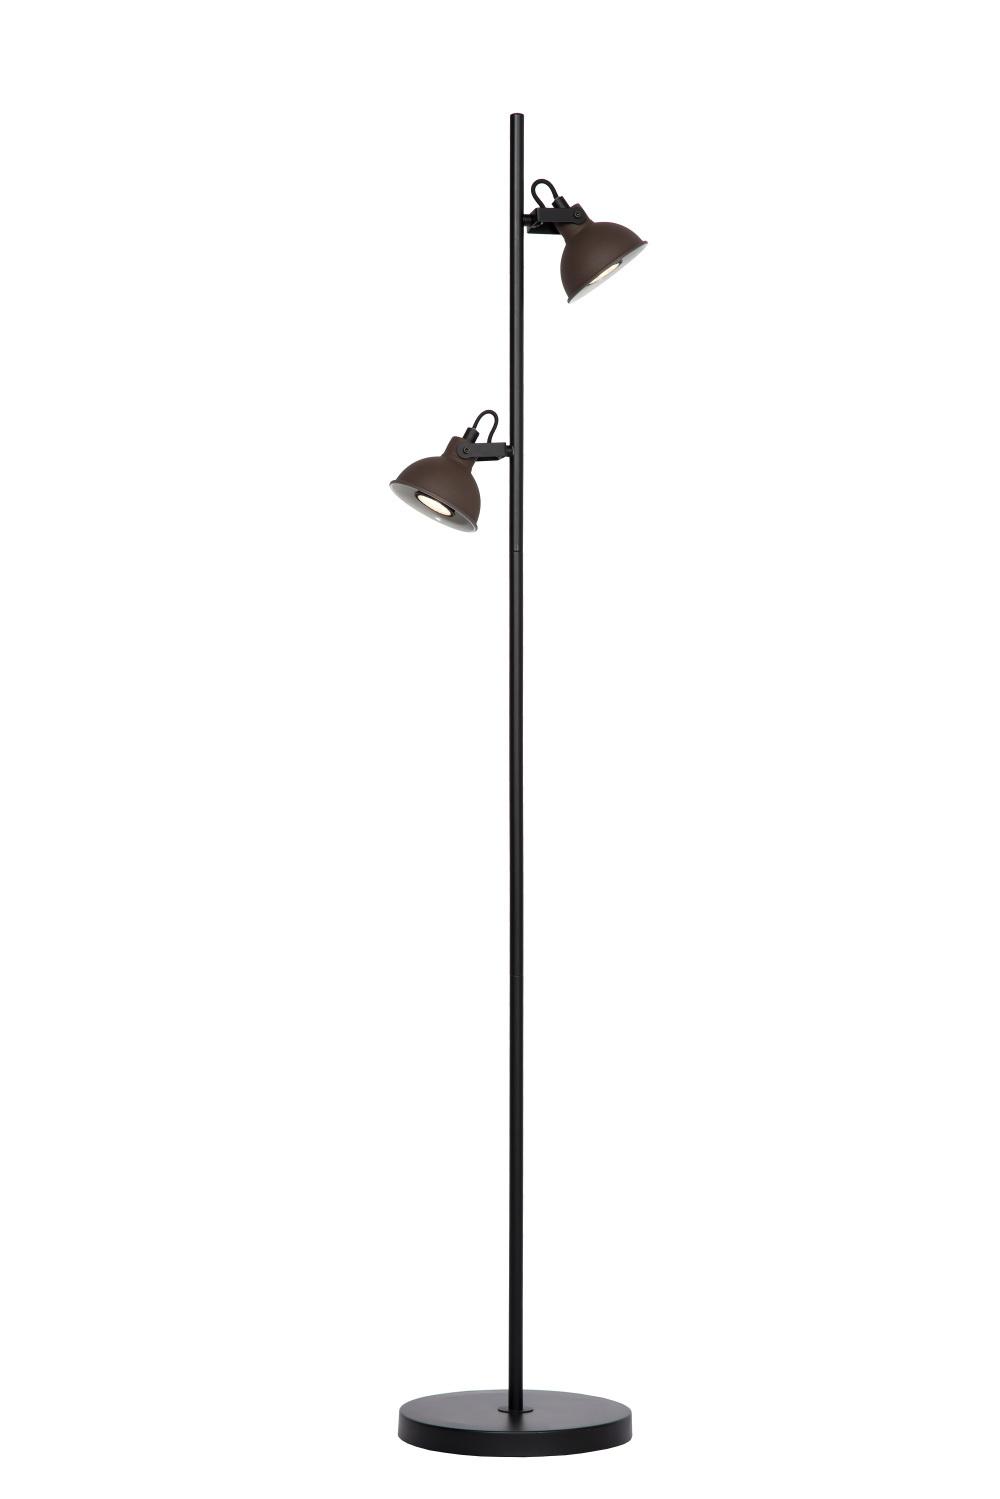 Lucide DAMIAN Vloerlamp GU10/35W H140cm Roest Zwart